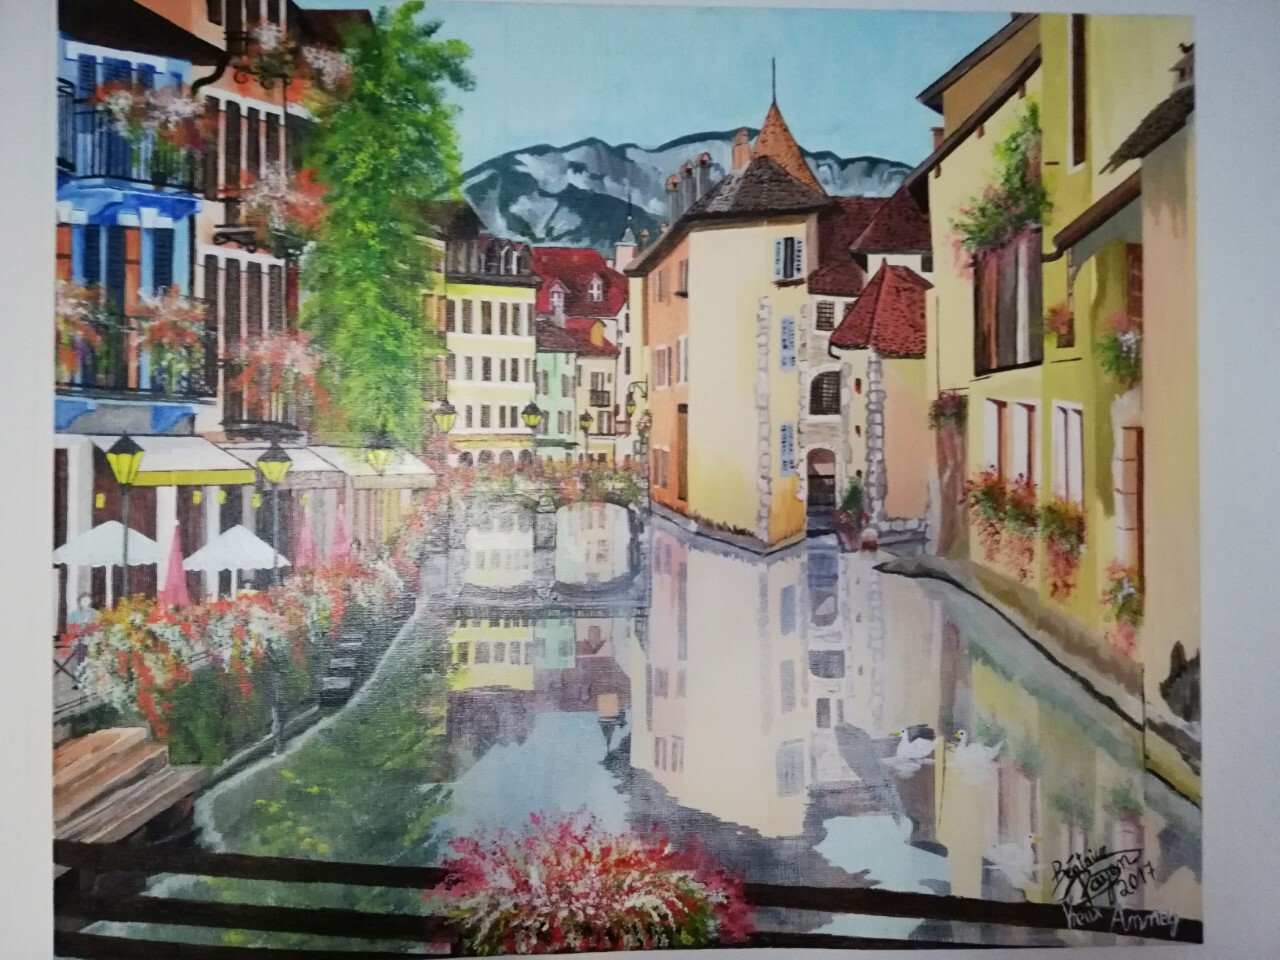 Annecy et sa vieille ville